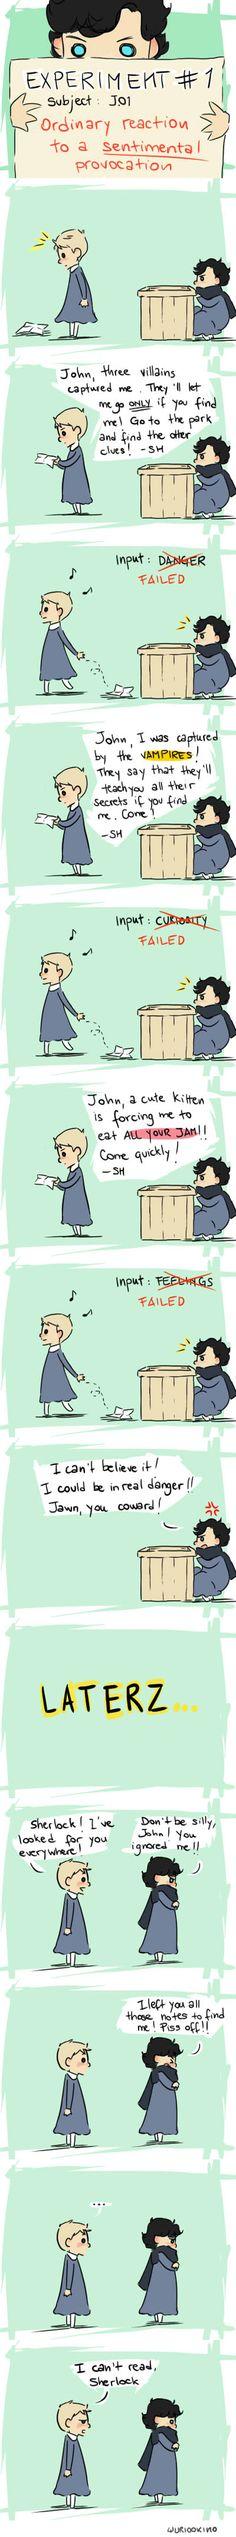 John an Sherlock as kids. How cute!